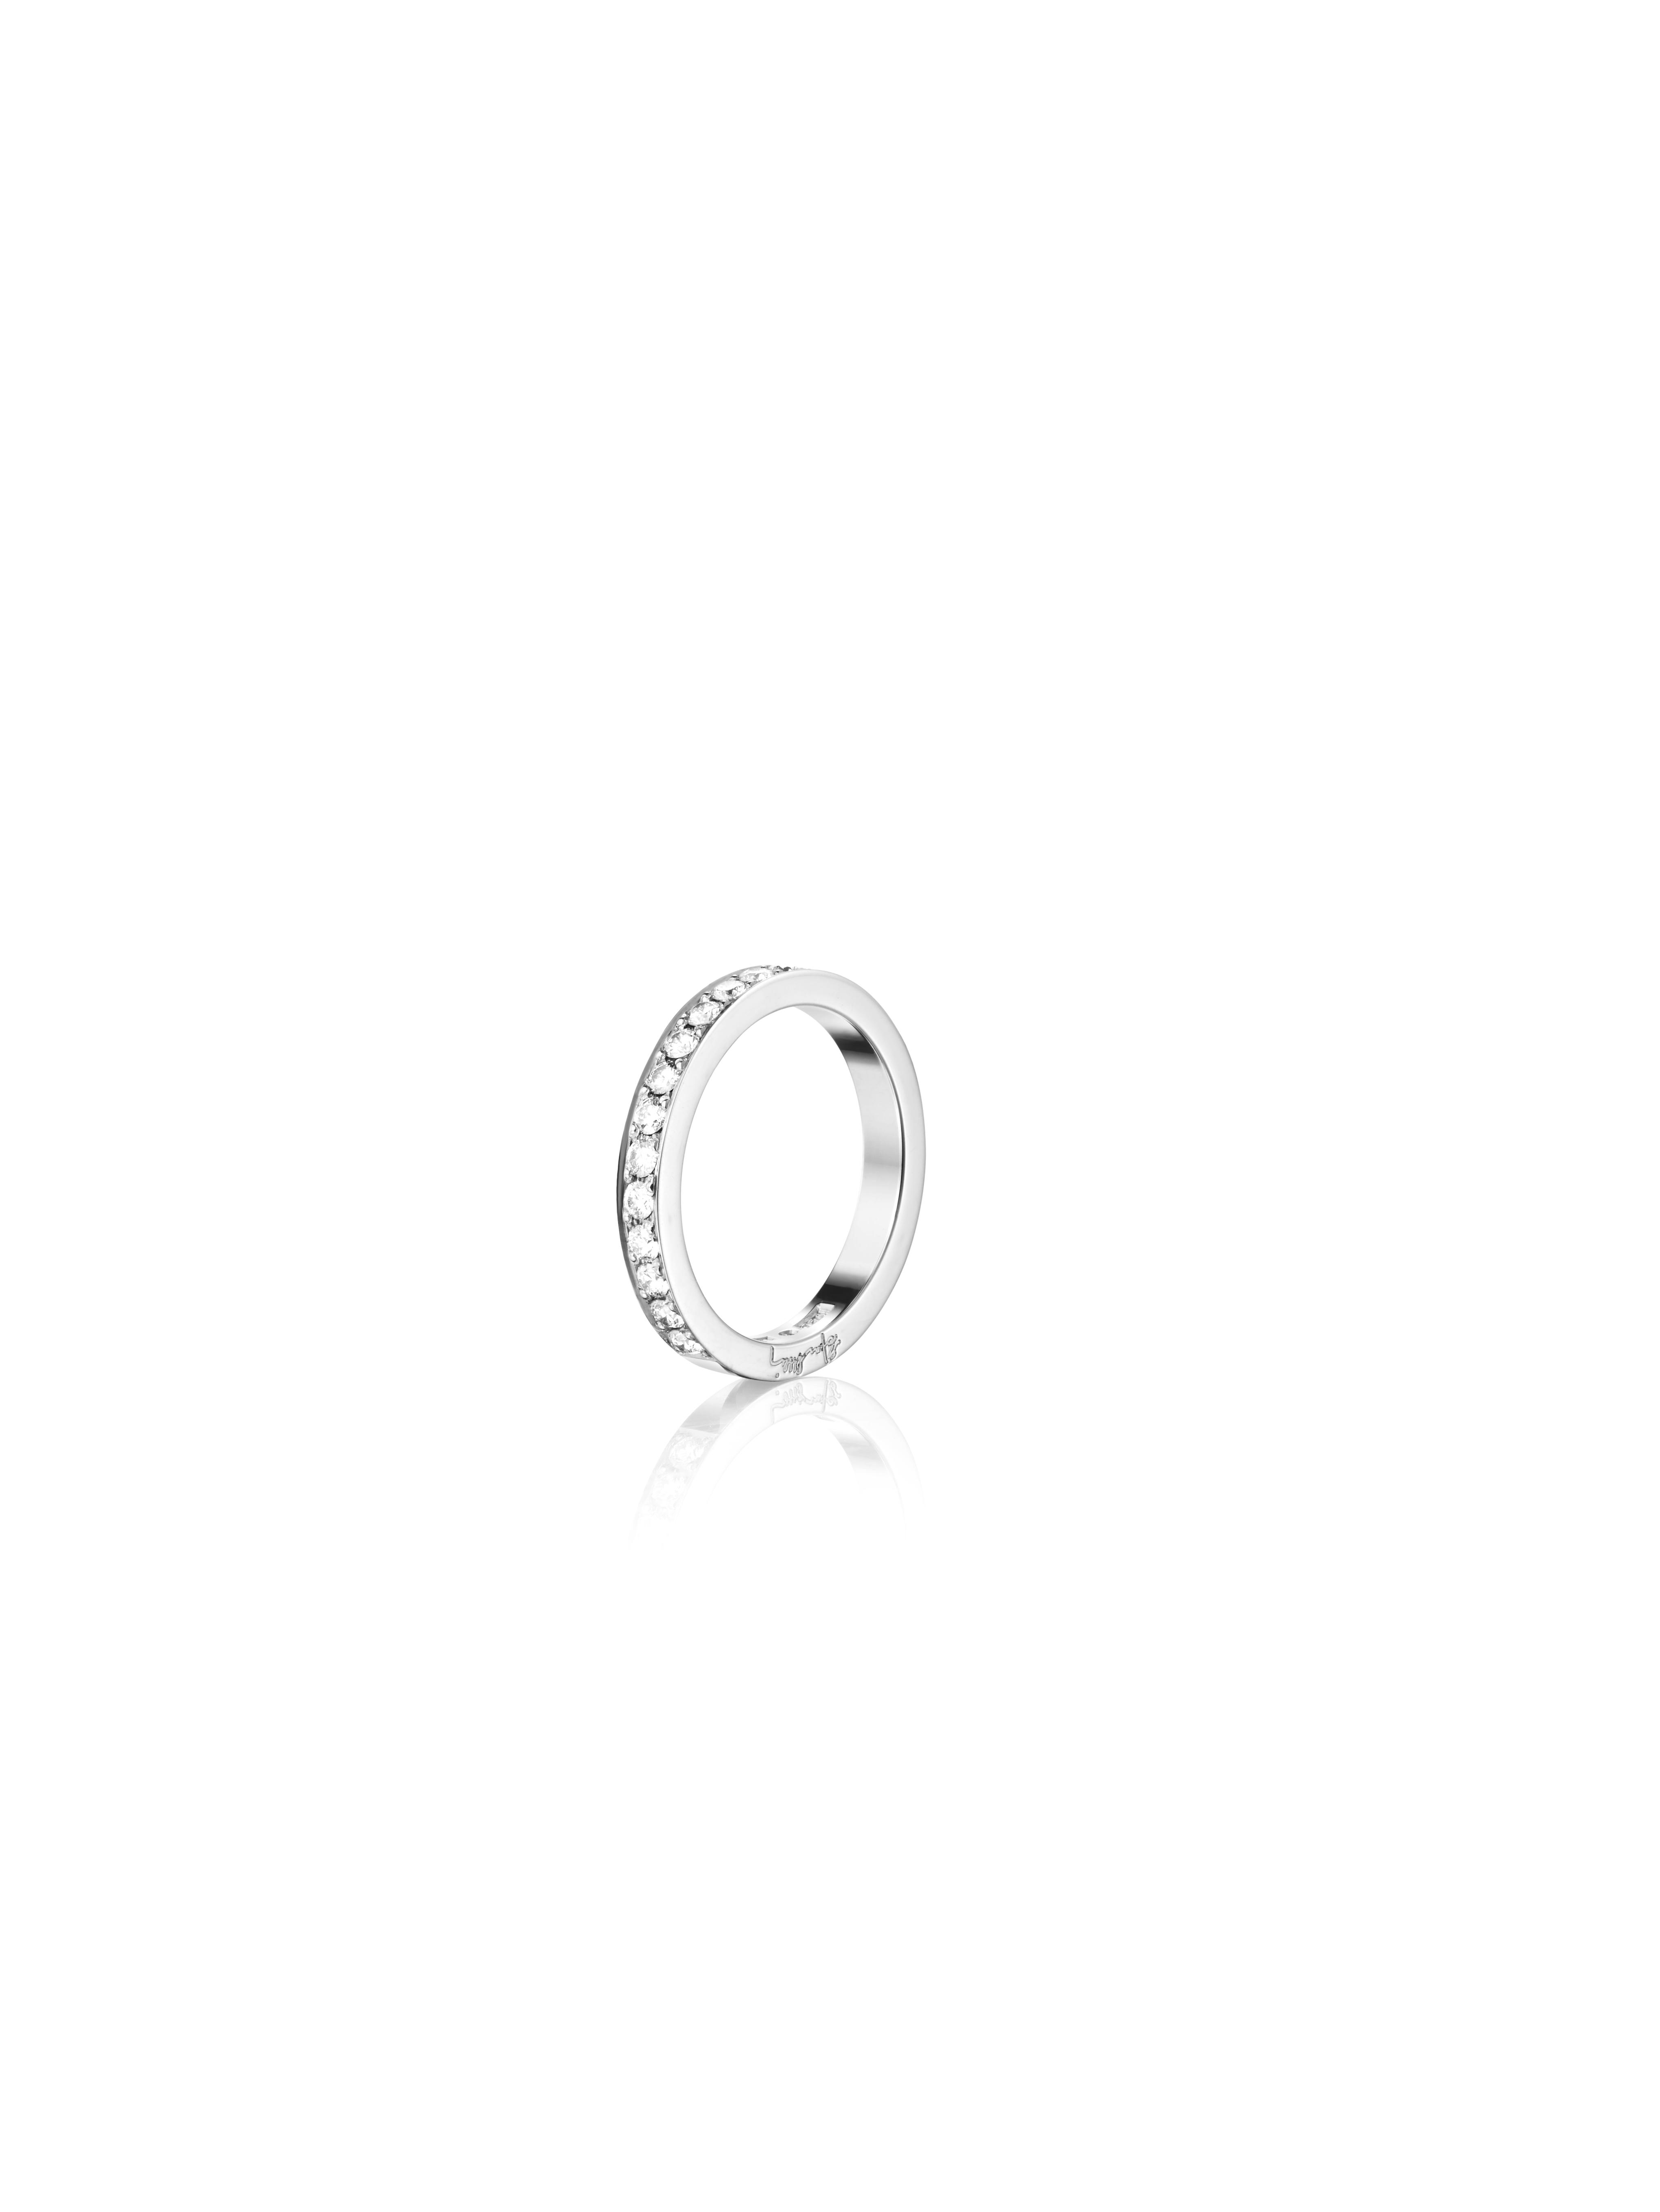 : - 13 Stars & Signature Ring Vitguld